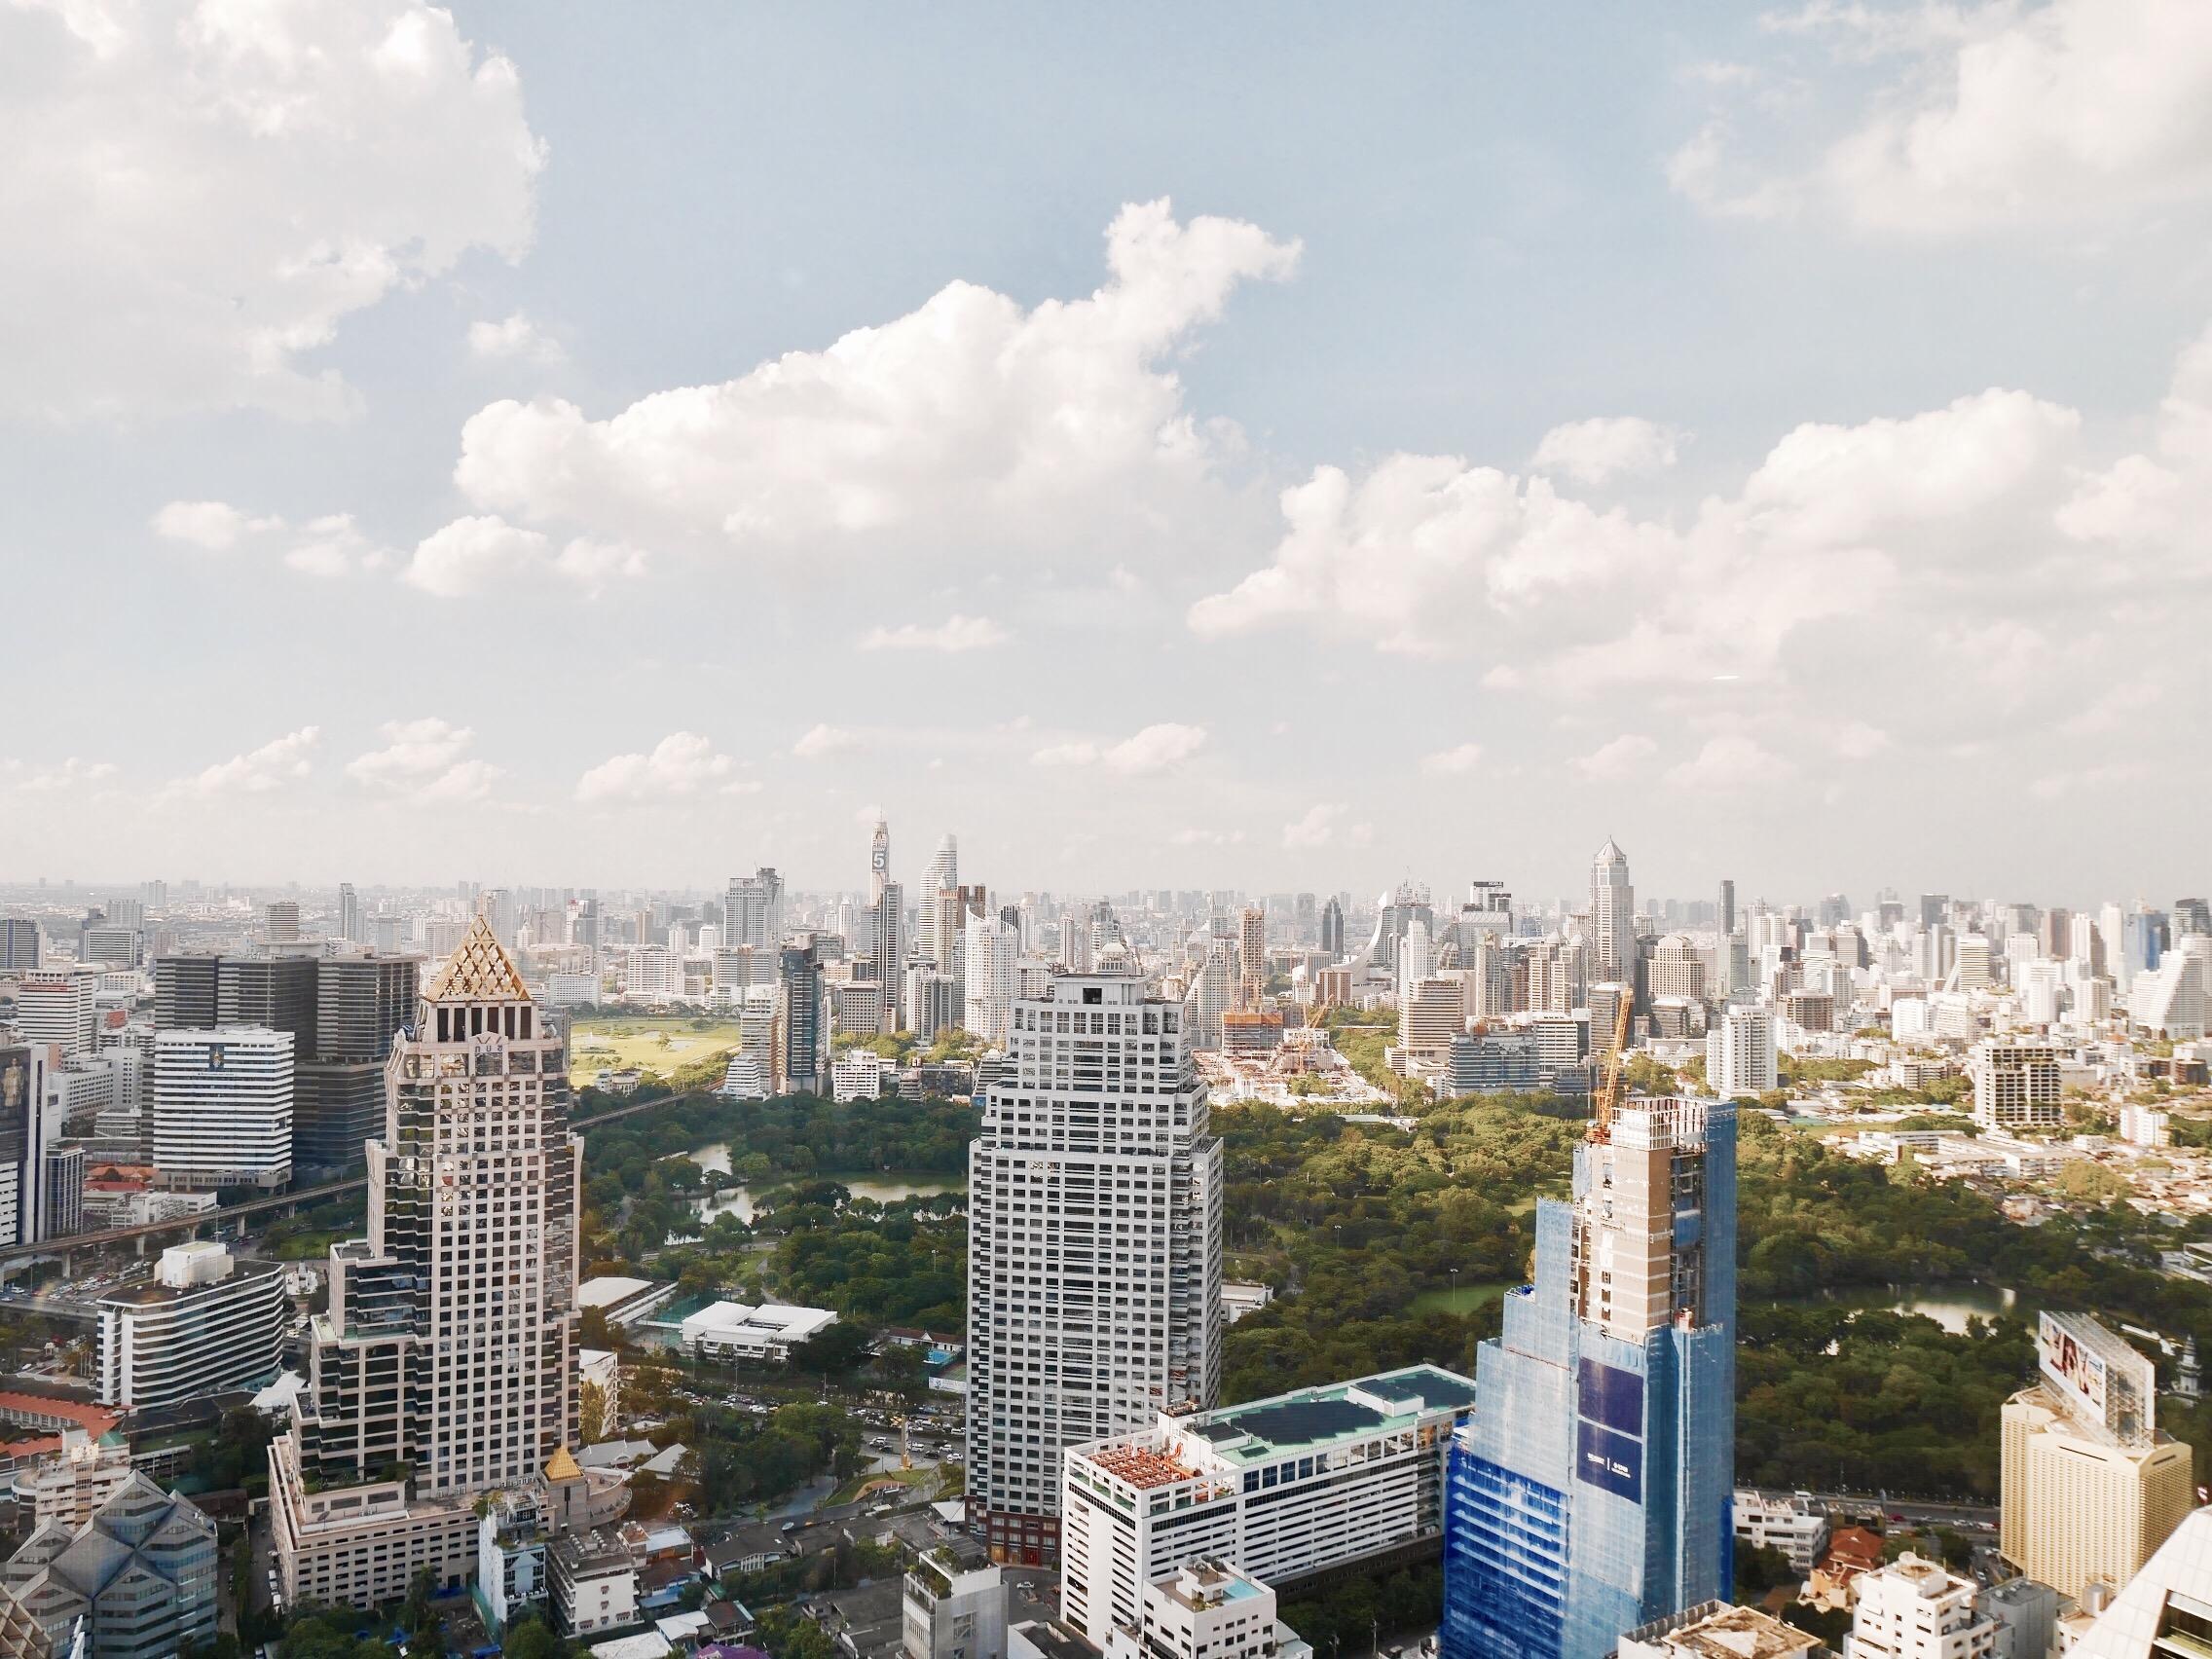 img 8211 - Banyan Tree Bangkok - 五つ星ホテルバンヤンツリーのSERENITY CLUBで過ごすリュクスな時間 「客室編」